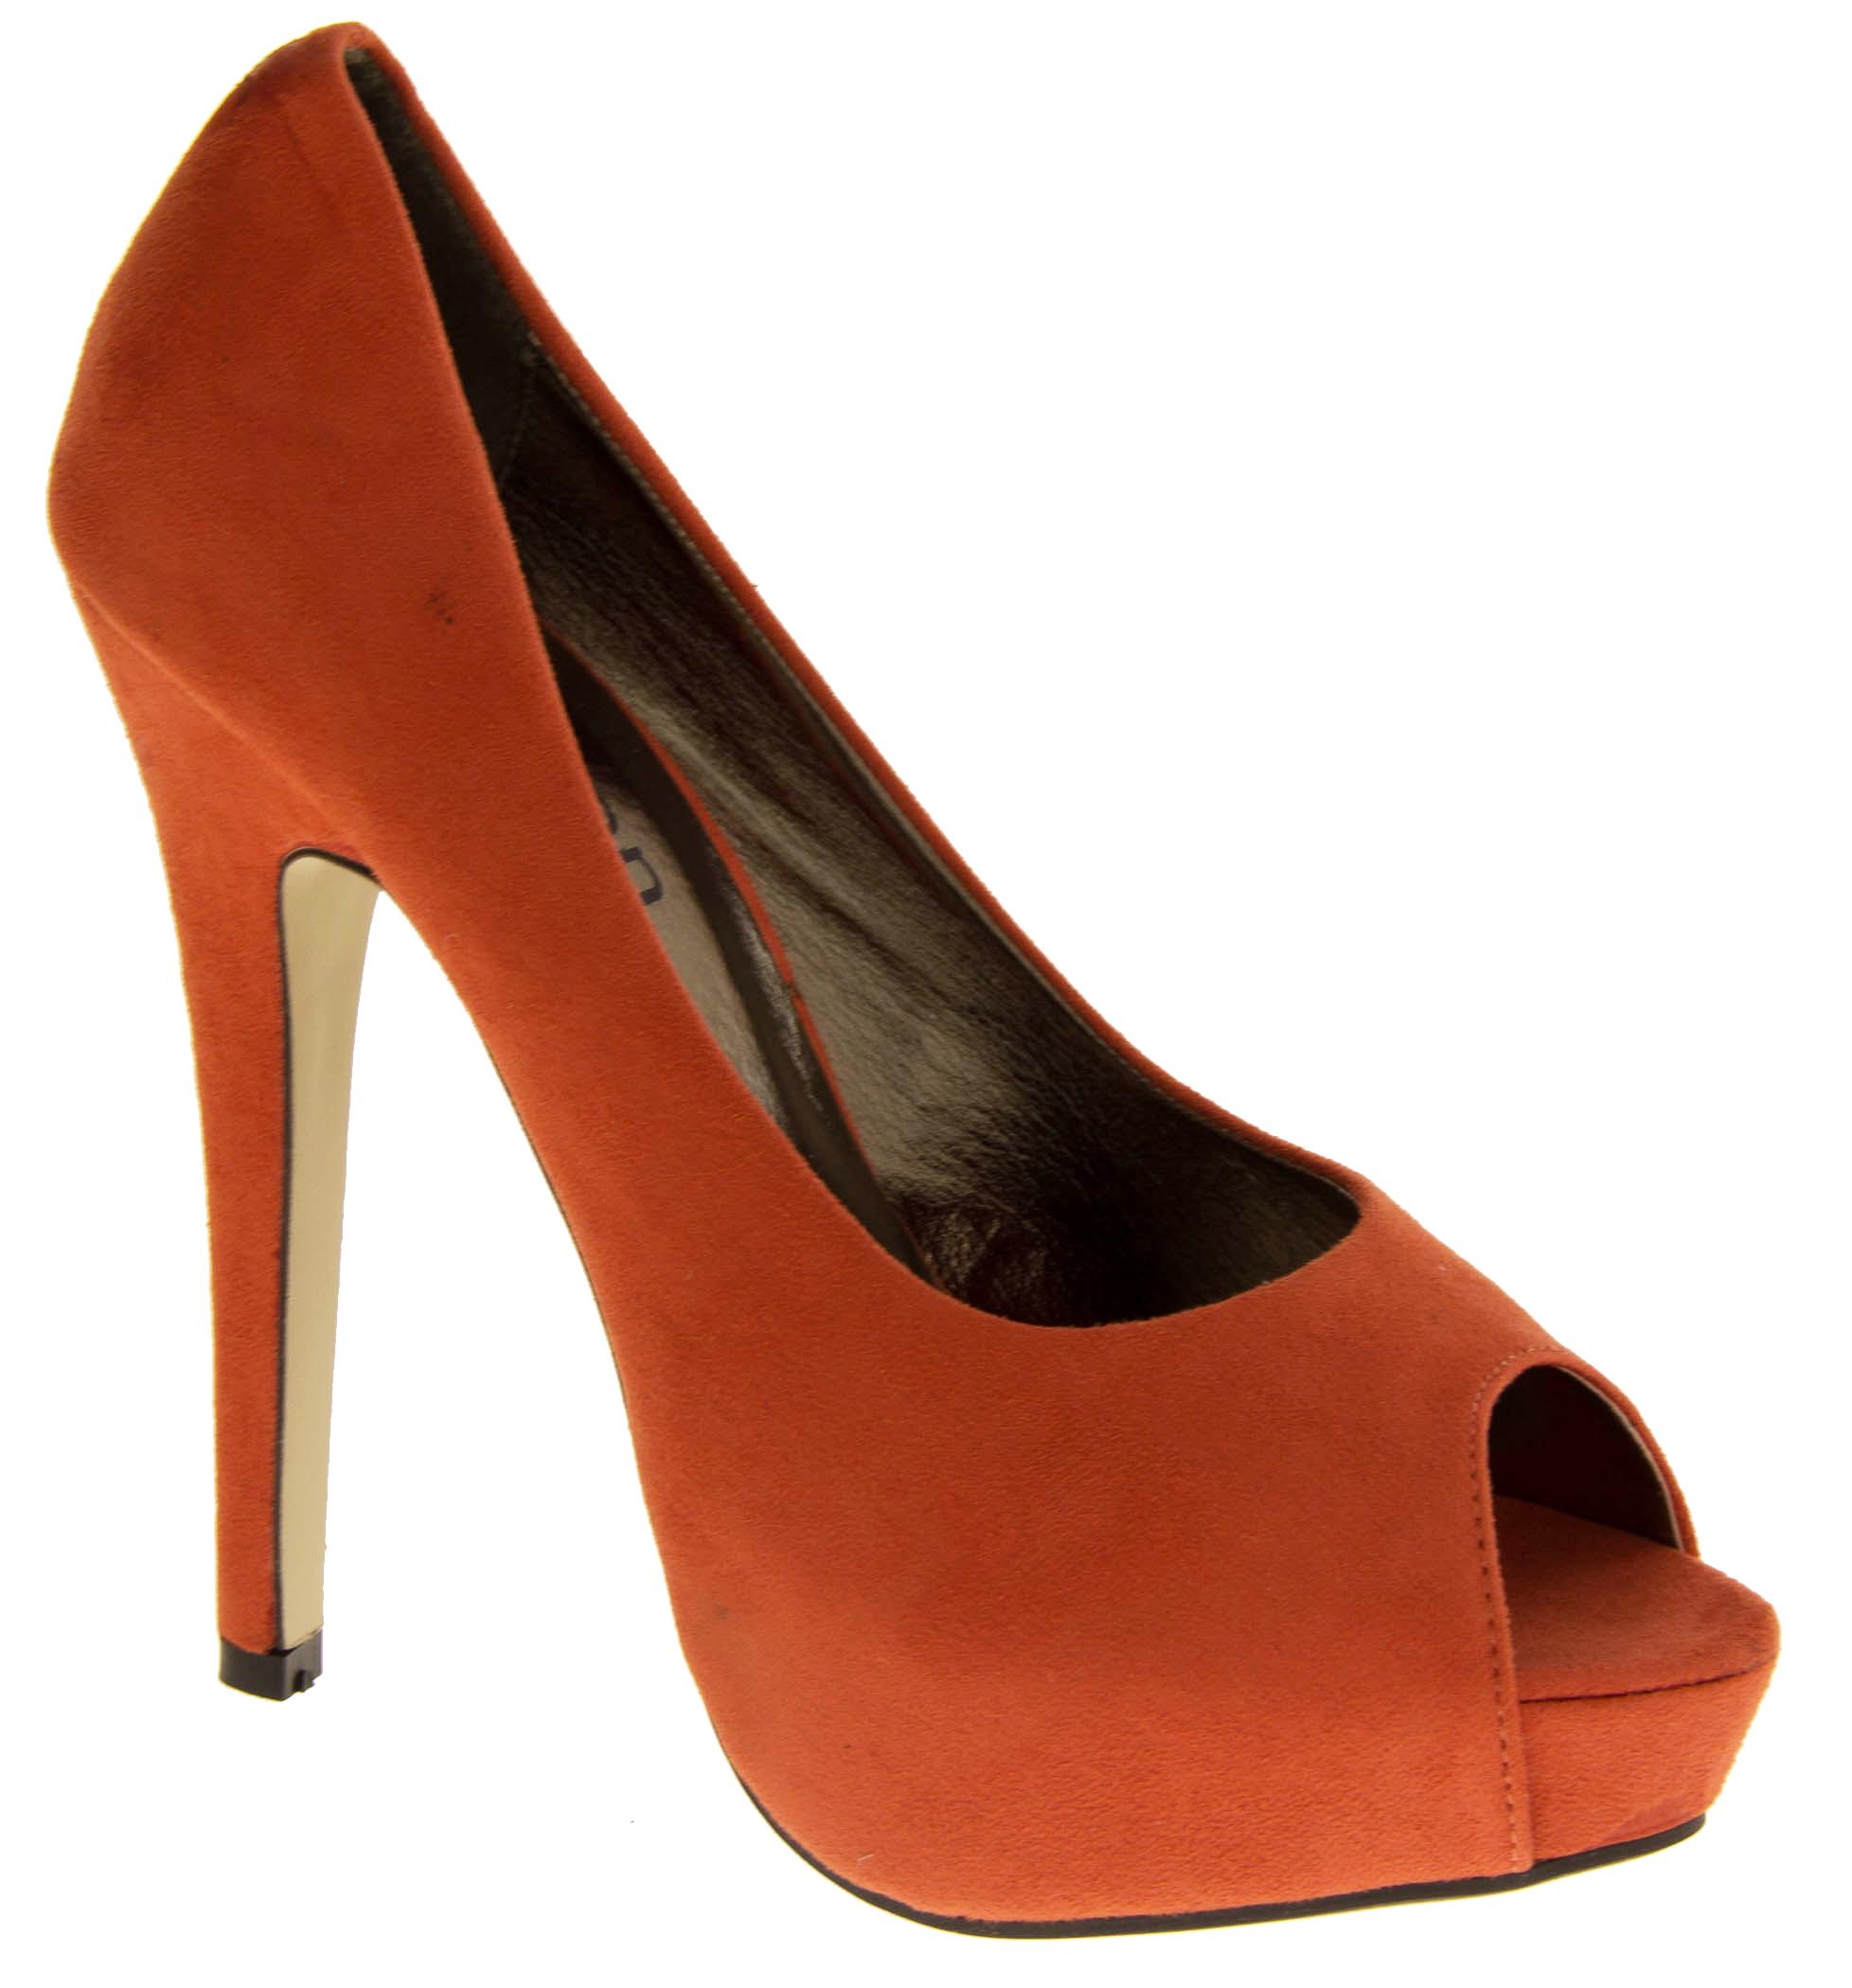 Ladies Prom High Heels Orange Faux Suede Platform Peep Toe Court Shoes Size 3 5